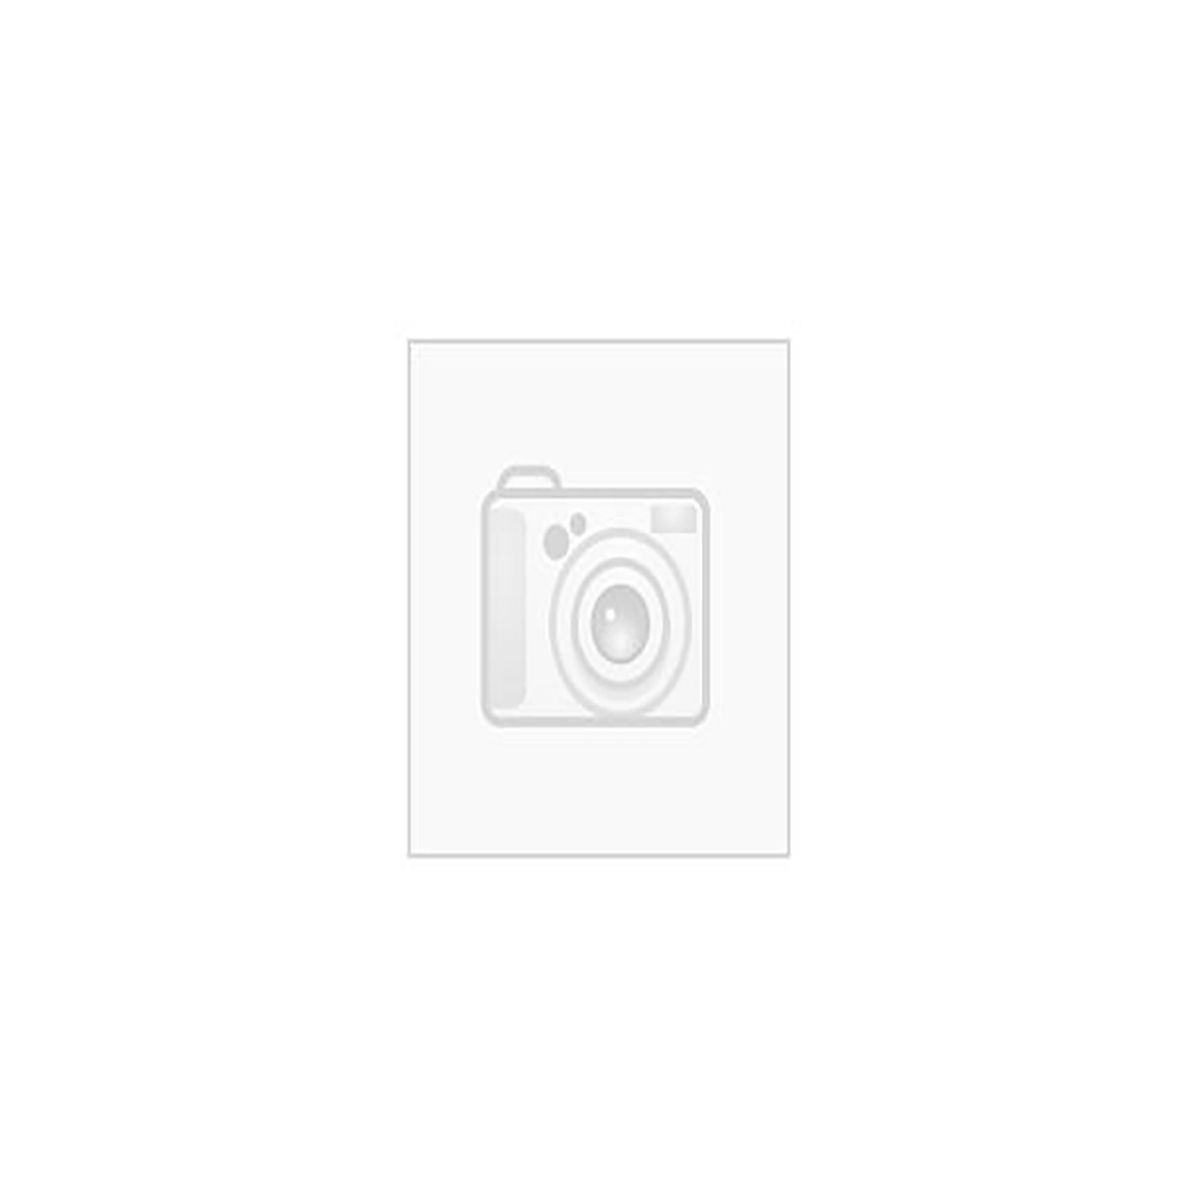 Kuplingsalbue for innbygningsisterne Sanipex  1/2 x 16 mm albu f/sisterne Sanipex